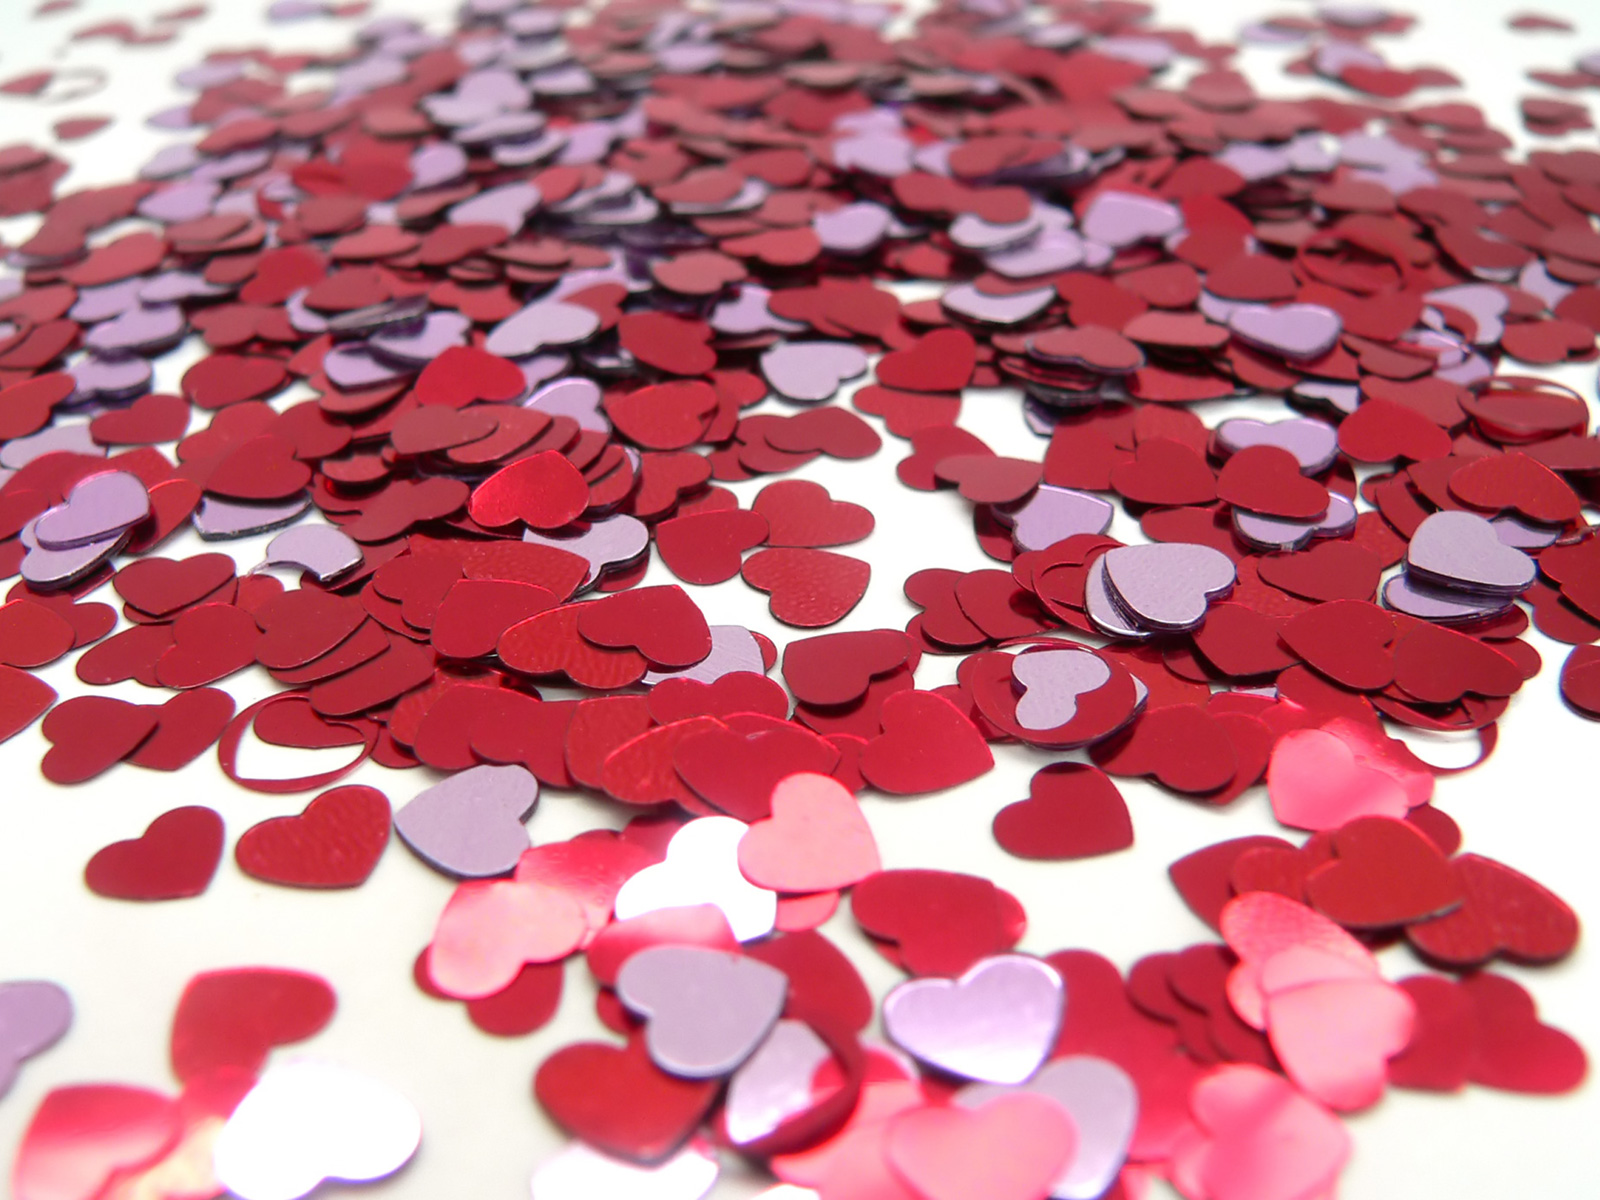 http://2.bp.blogspot.com/_xNrogU89eOY/TTXXtAW8fTI/AAAAAAAABKs/uIFKsHFhCZc/s1600/Valentine_Heart_Confetti.jpg